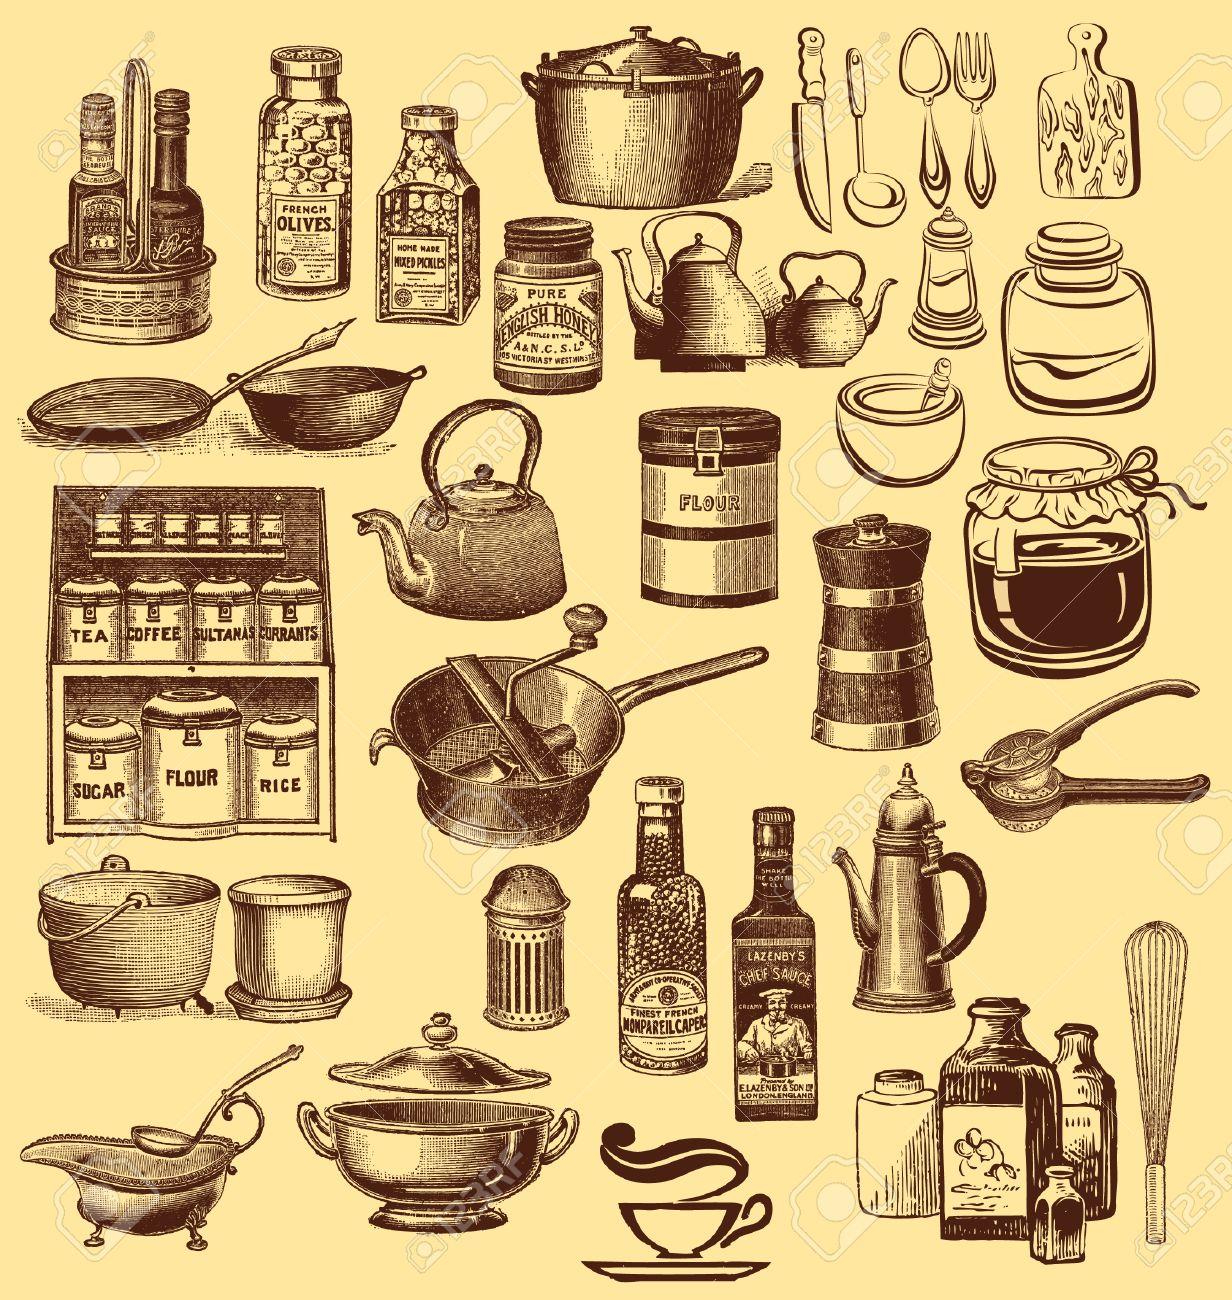 Accesorios De Cocina Vintage. Kitchen Love In The Home Of By Cocina ...